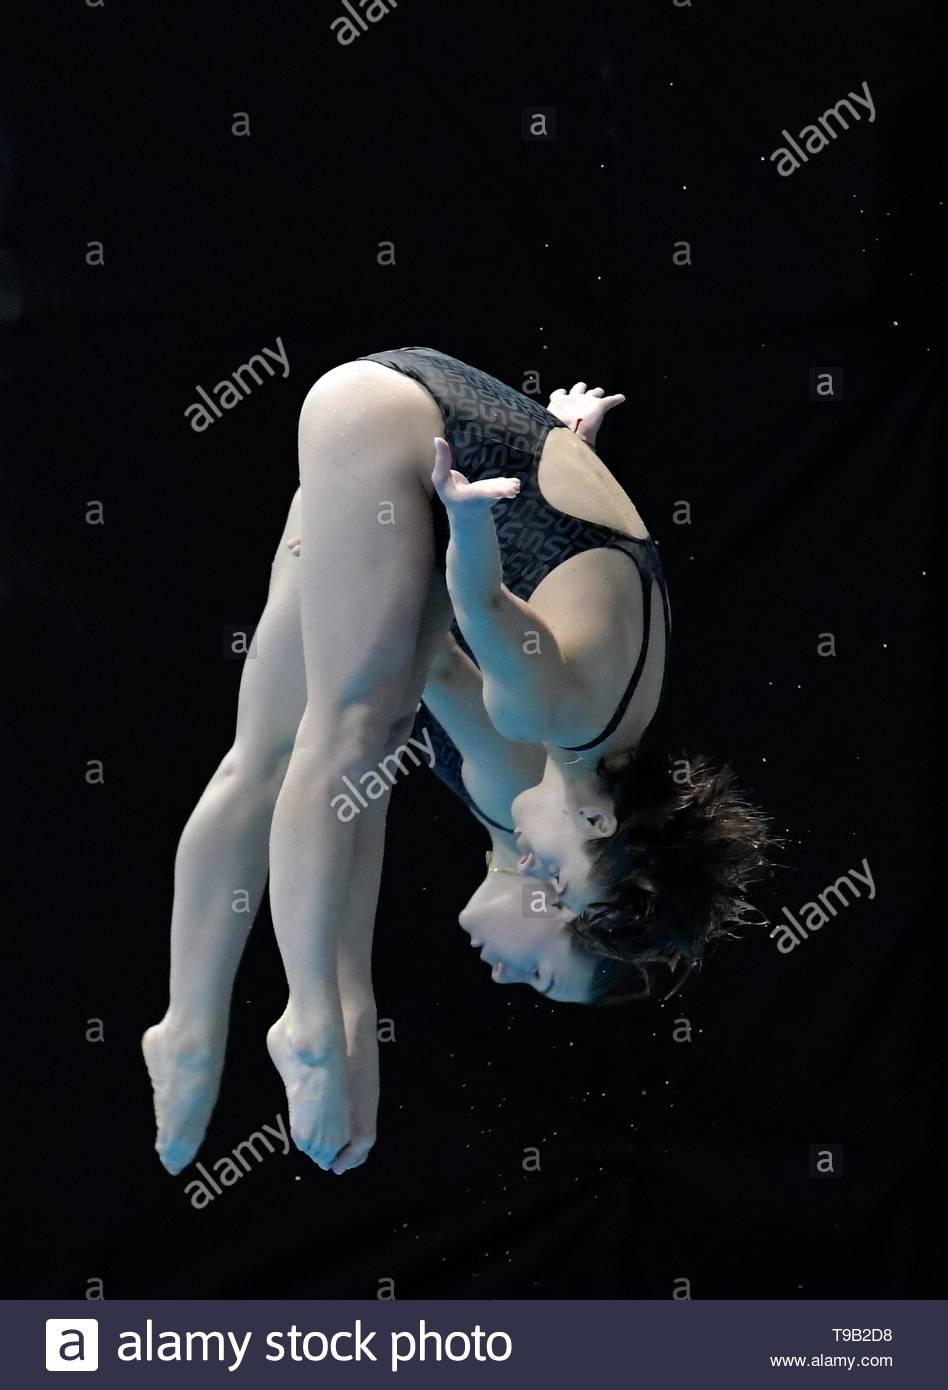 London UK 17th Ma7 2019 FiINA/CNSG Diving World Series 2019 London at Olympic Pool Queen Elizabeth Park London UK Women's 3m Synchro Springboard Final Viktoriya Kesar & Anna Pysmenska UKR - Stock Image